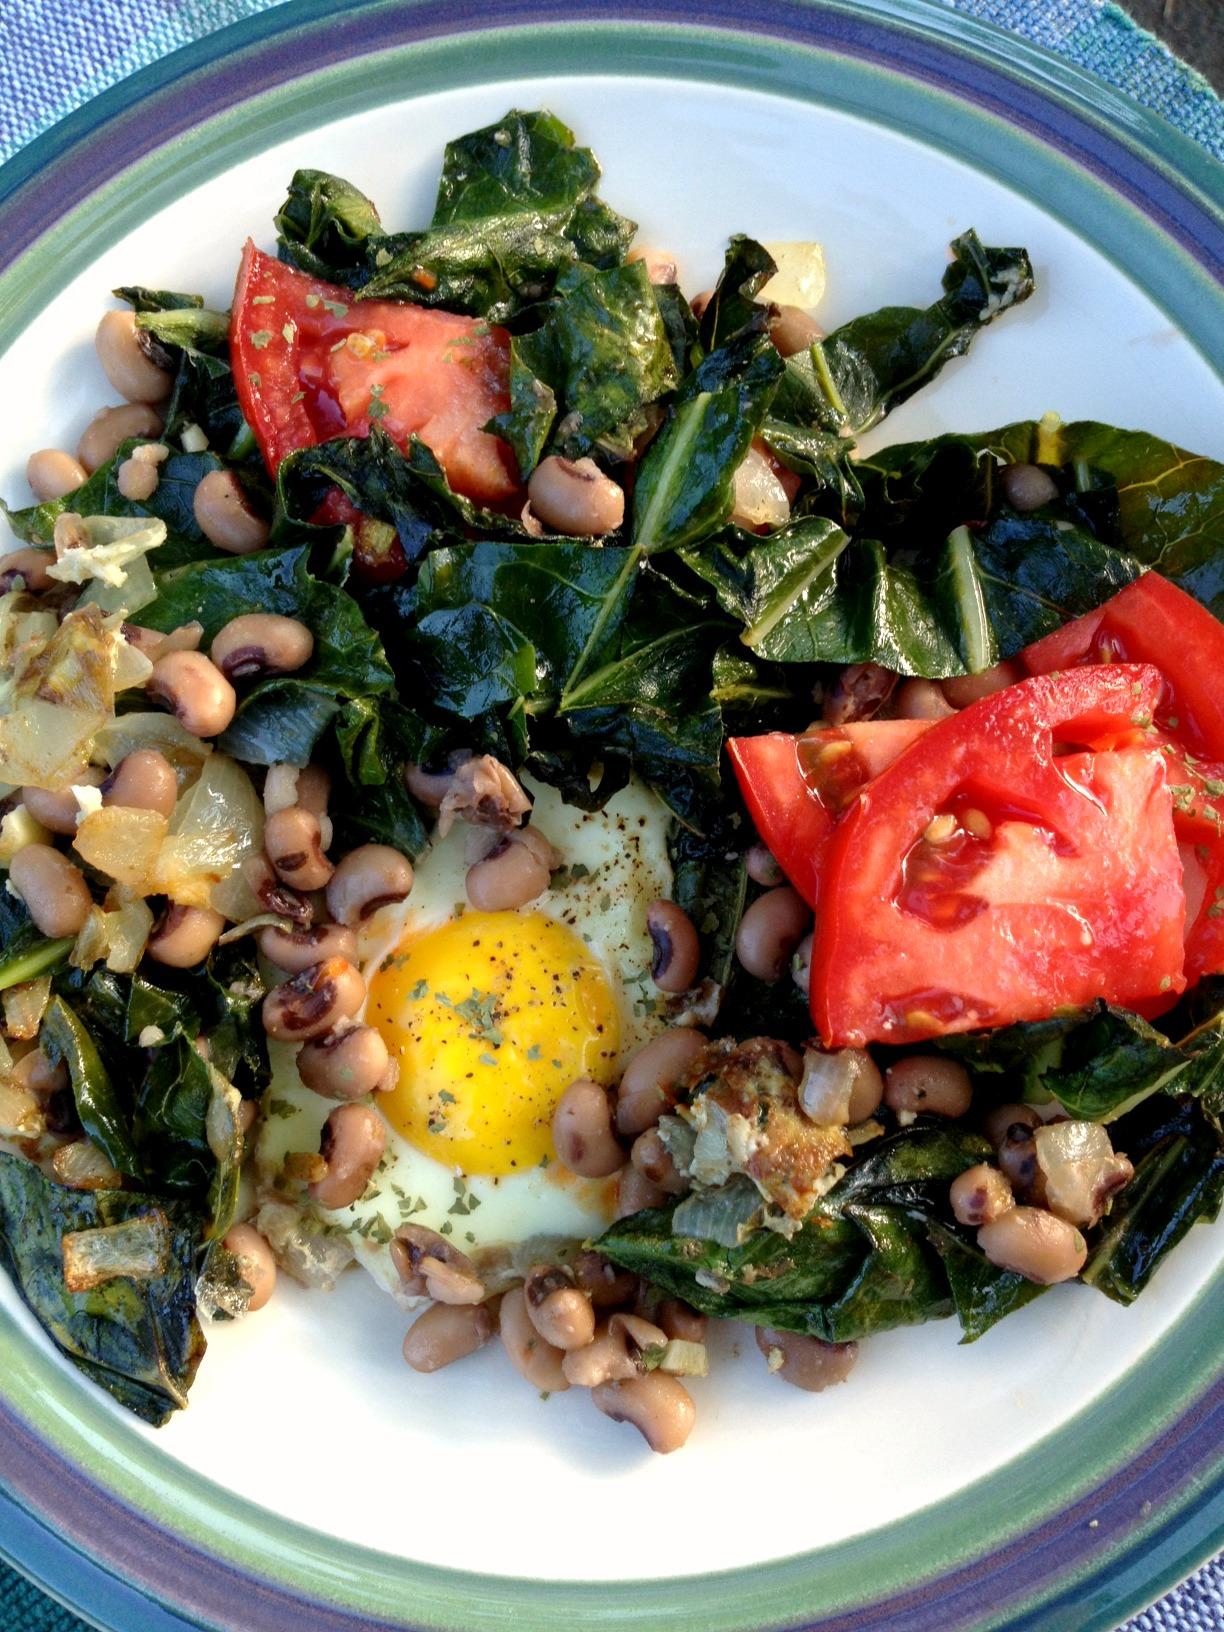 Collards, Black Eyed Peas, Tomato and Fried Egg